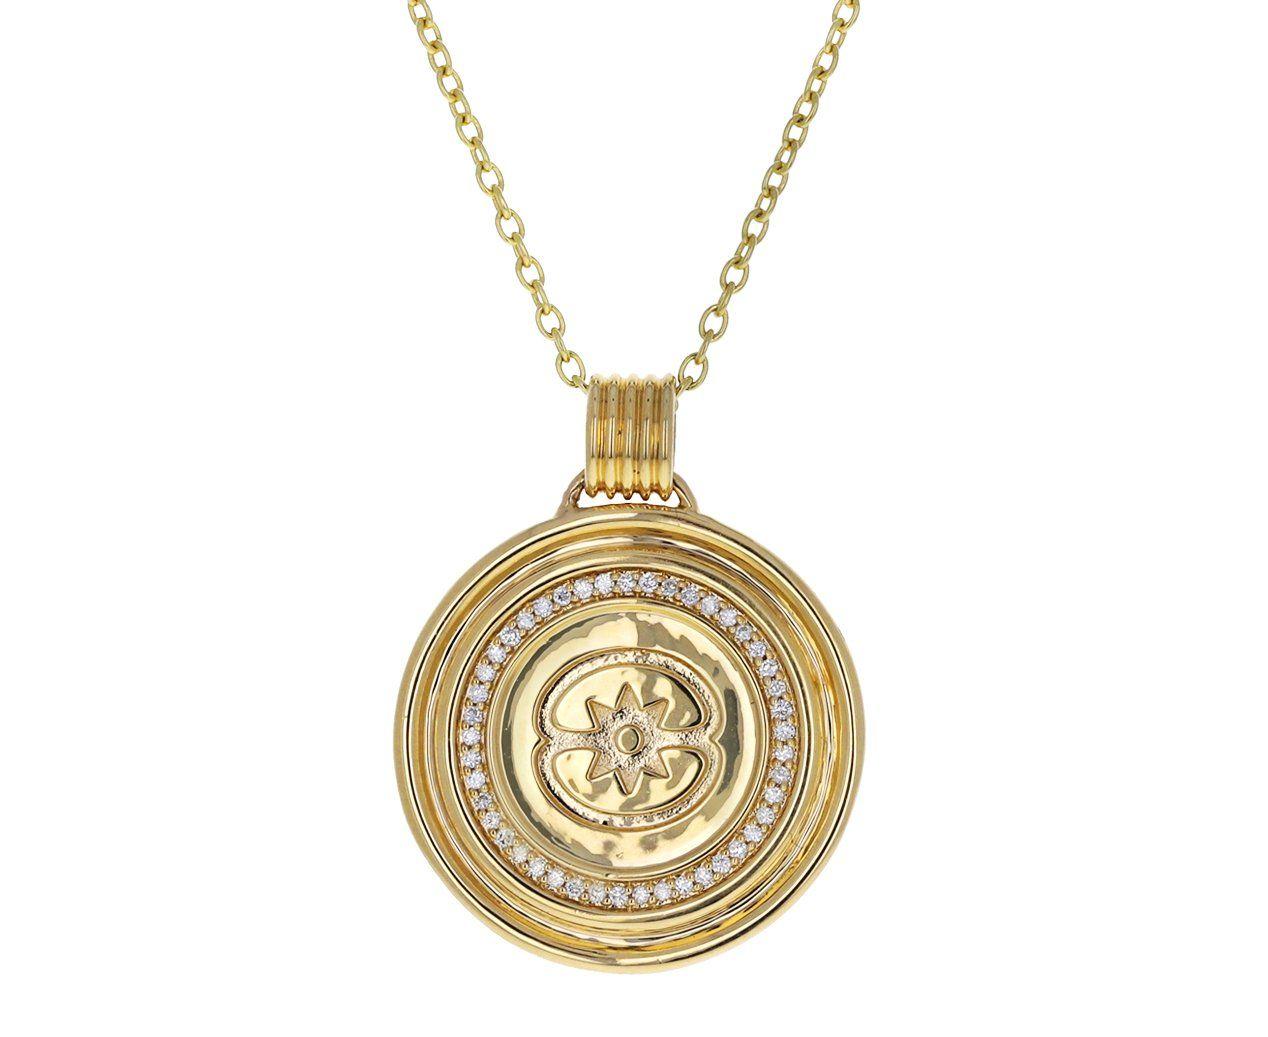 Diamond Stella Medallion Necklace Yellow Gold Chain Necklace Gold Medallion